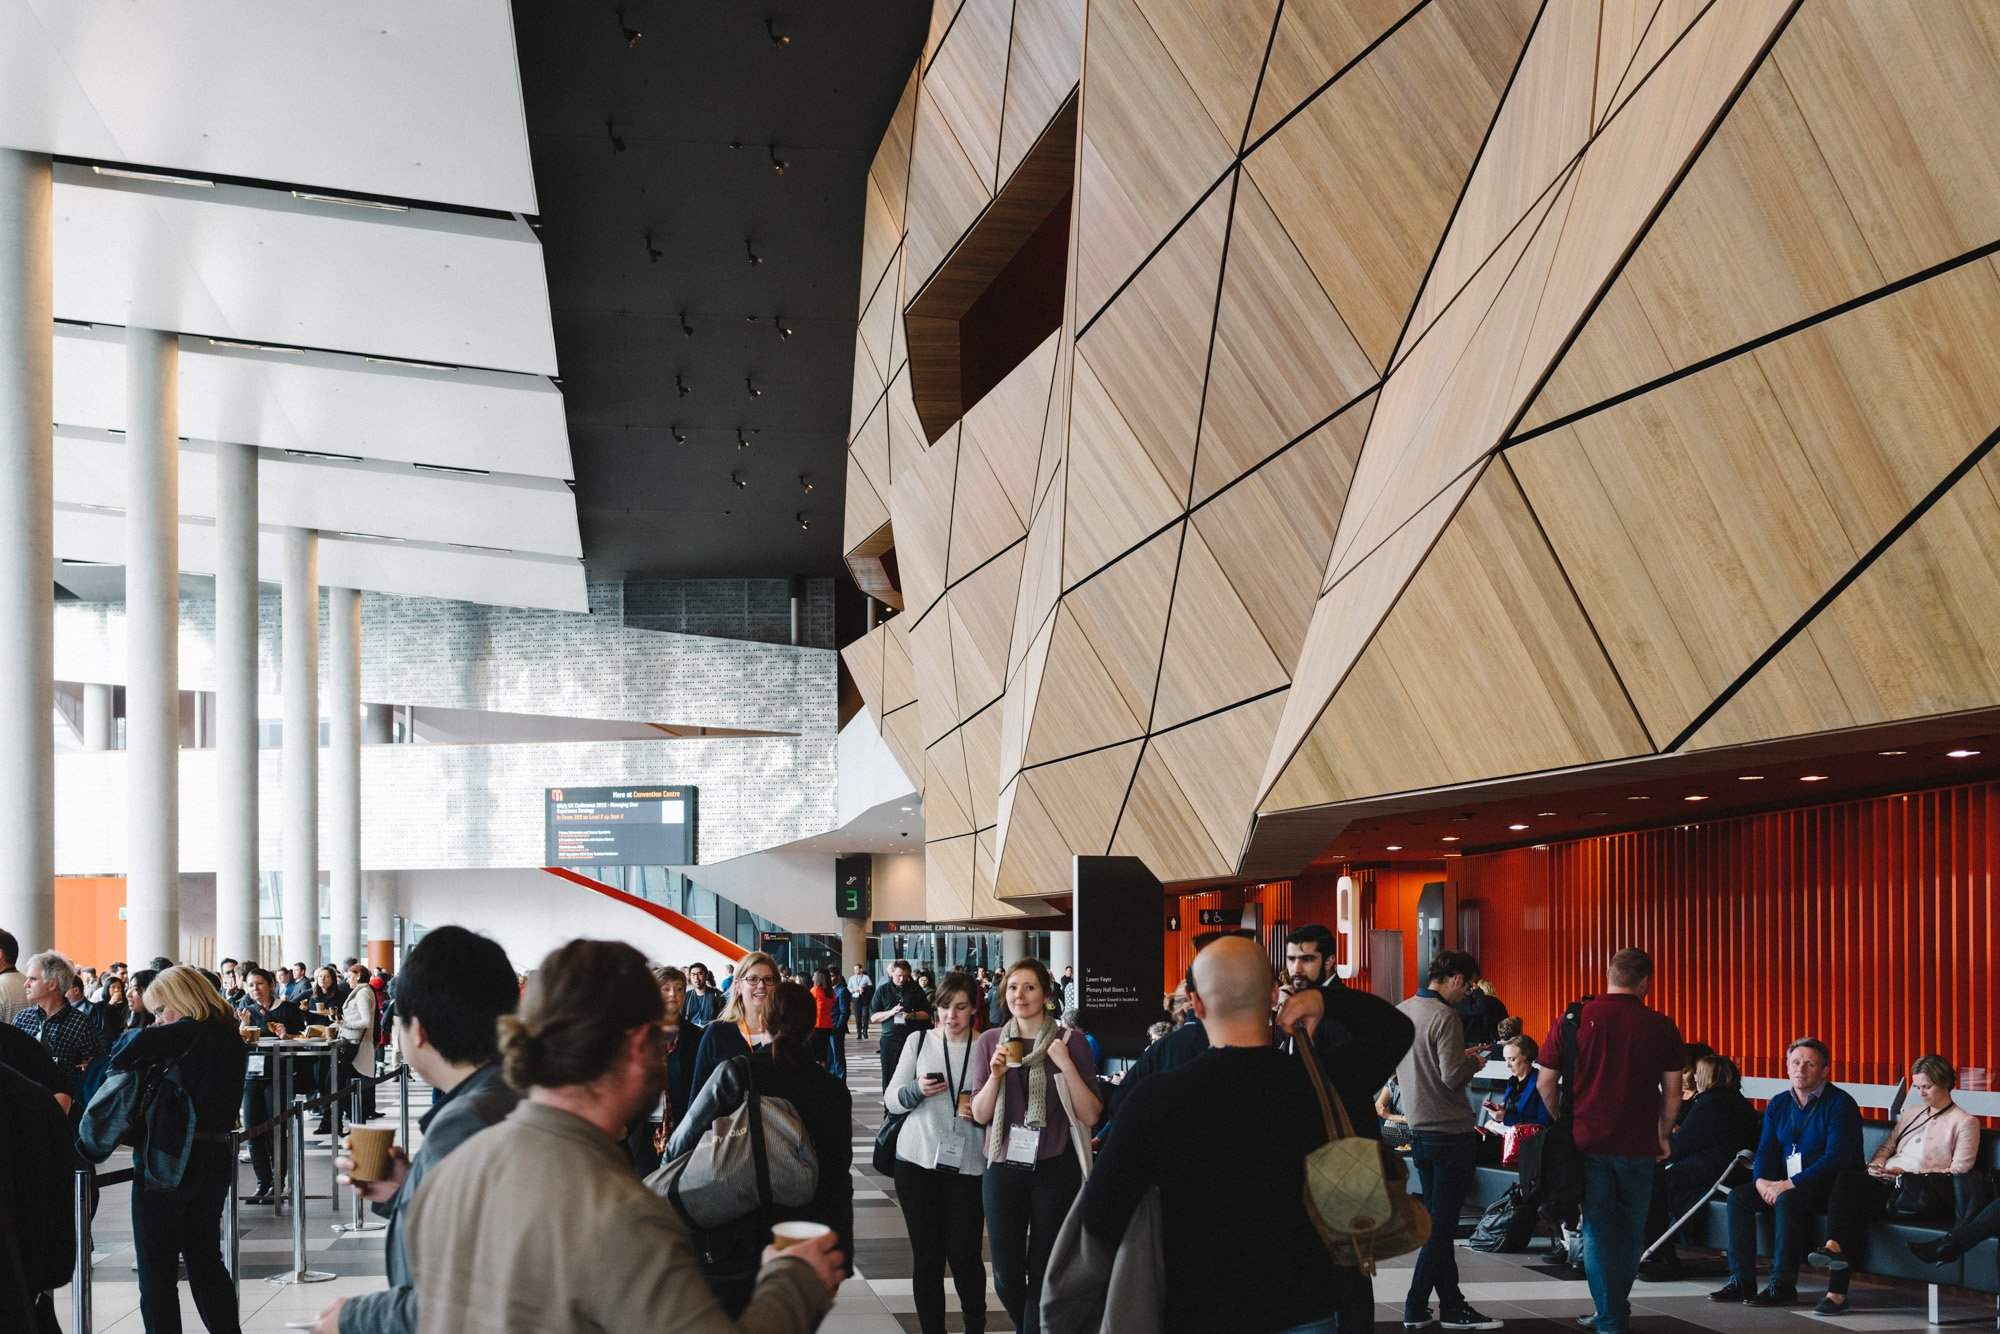 TEDxMelbourne Melbourne Convention and Exhibition Centre